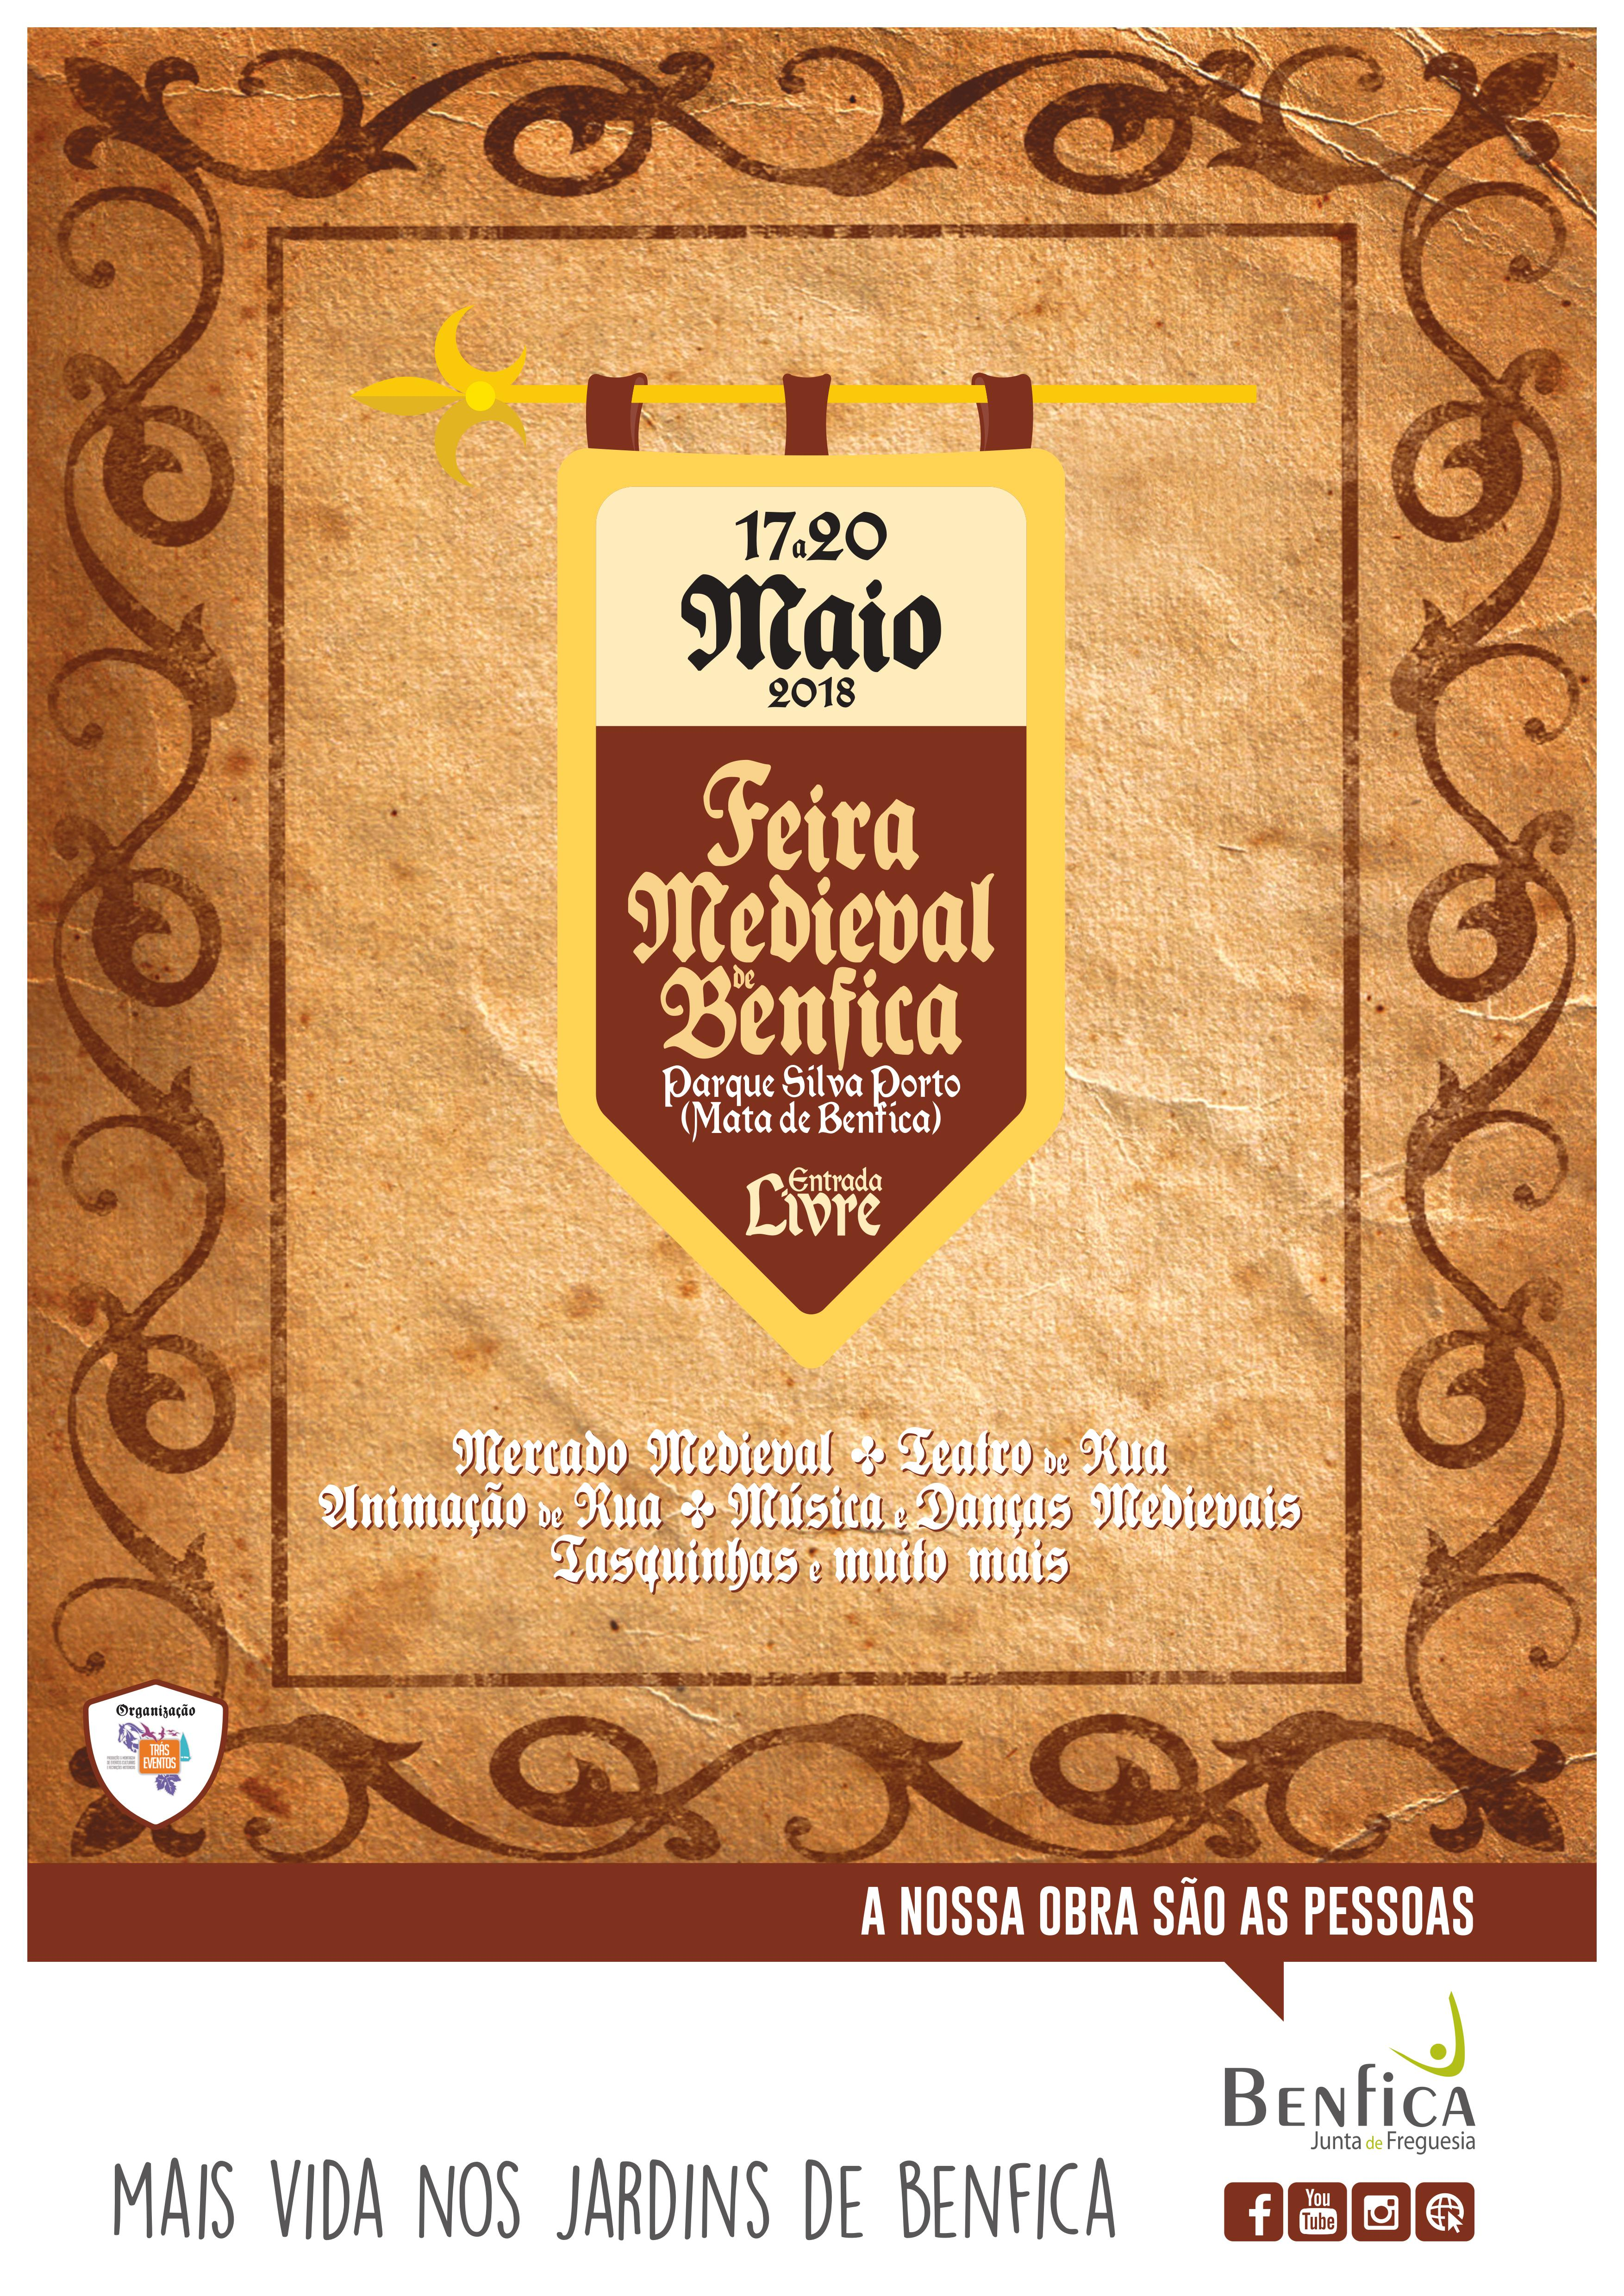 Poster Feira Medieval de Benfica 2018 f24b0c57f37c4